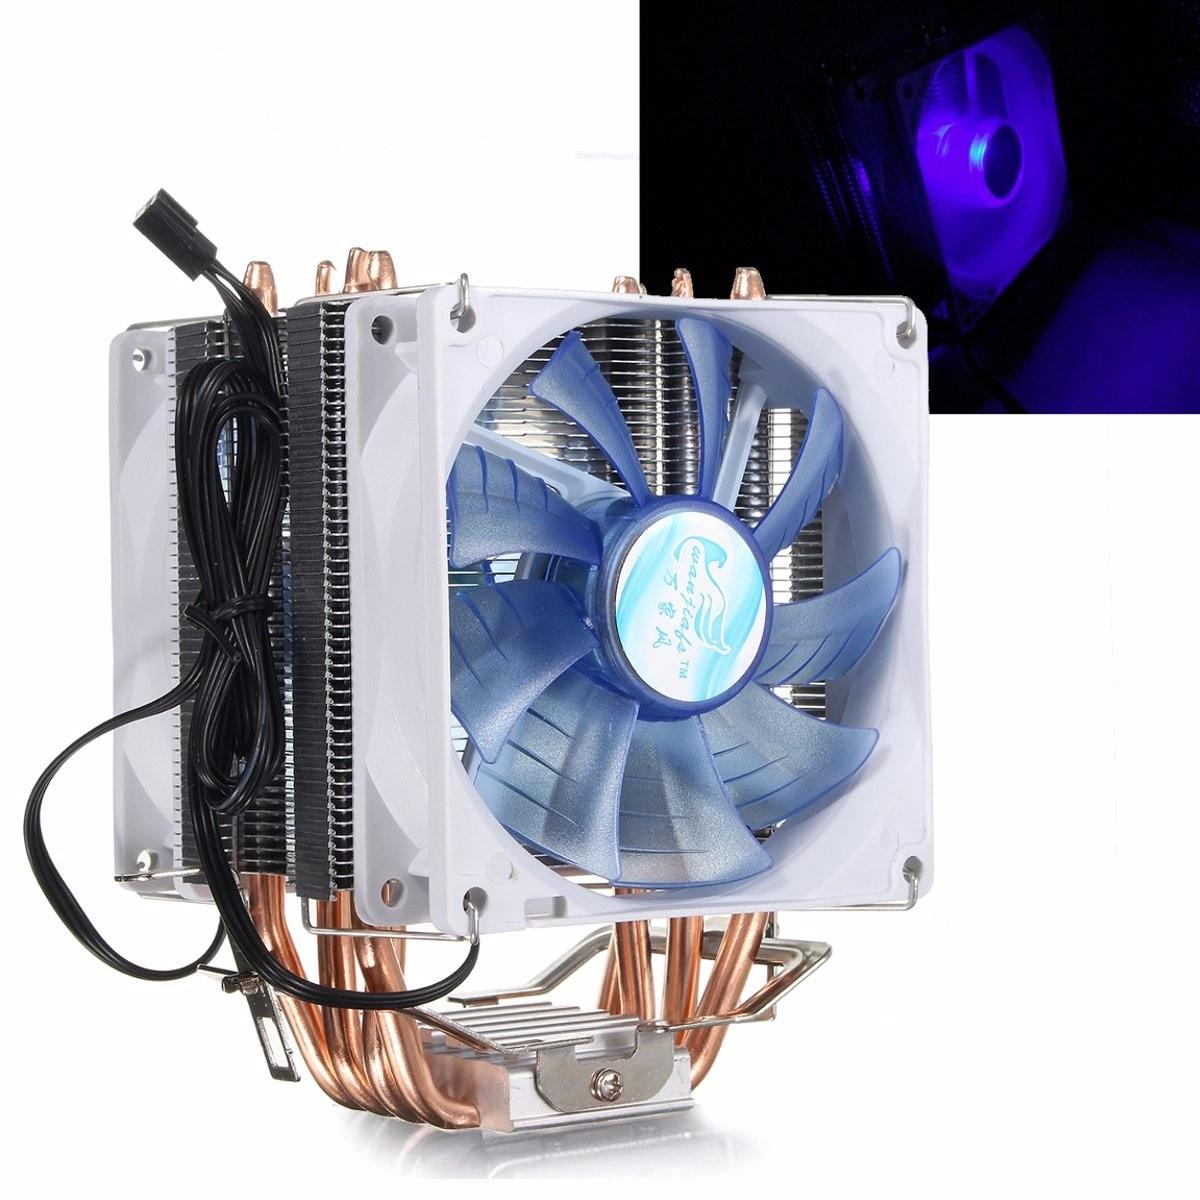 12V Dual CPU Cooler Fan Quiet Blue LED Light 92x92x25mm 3pin Powerful Fan Heatsink for Intel LGA775/1156/1155 for AMD AM2/312V Dual CPU Cooler Fan Quiet Blue LED Light 92x92x25mm 3pin Powerful Fan Heatsink for Intel LGA775/1156/1155 for AMD AM2/3